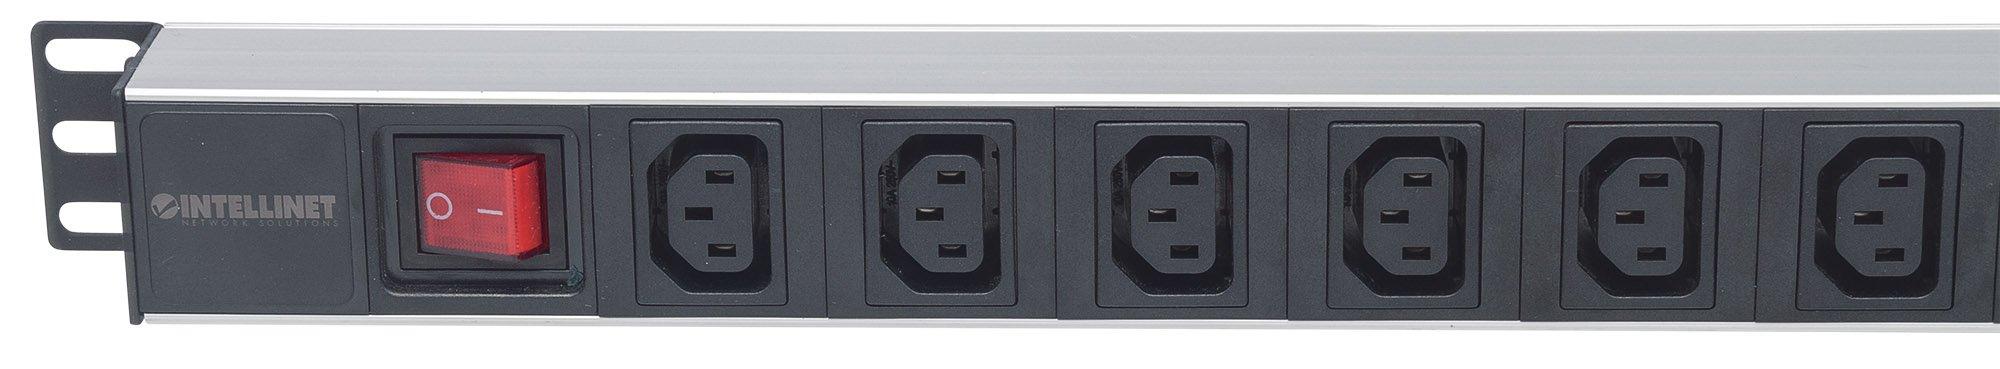 Intellinet 19'' 1U Rackmount Anti-Shedding 8-Output C13 Power Distribution Unit (PDU) by Intellinet (Image #3)